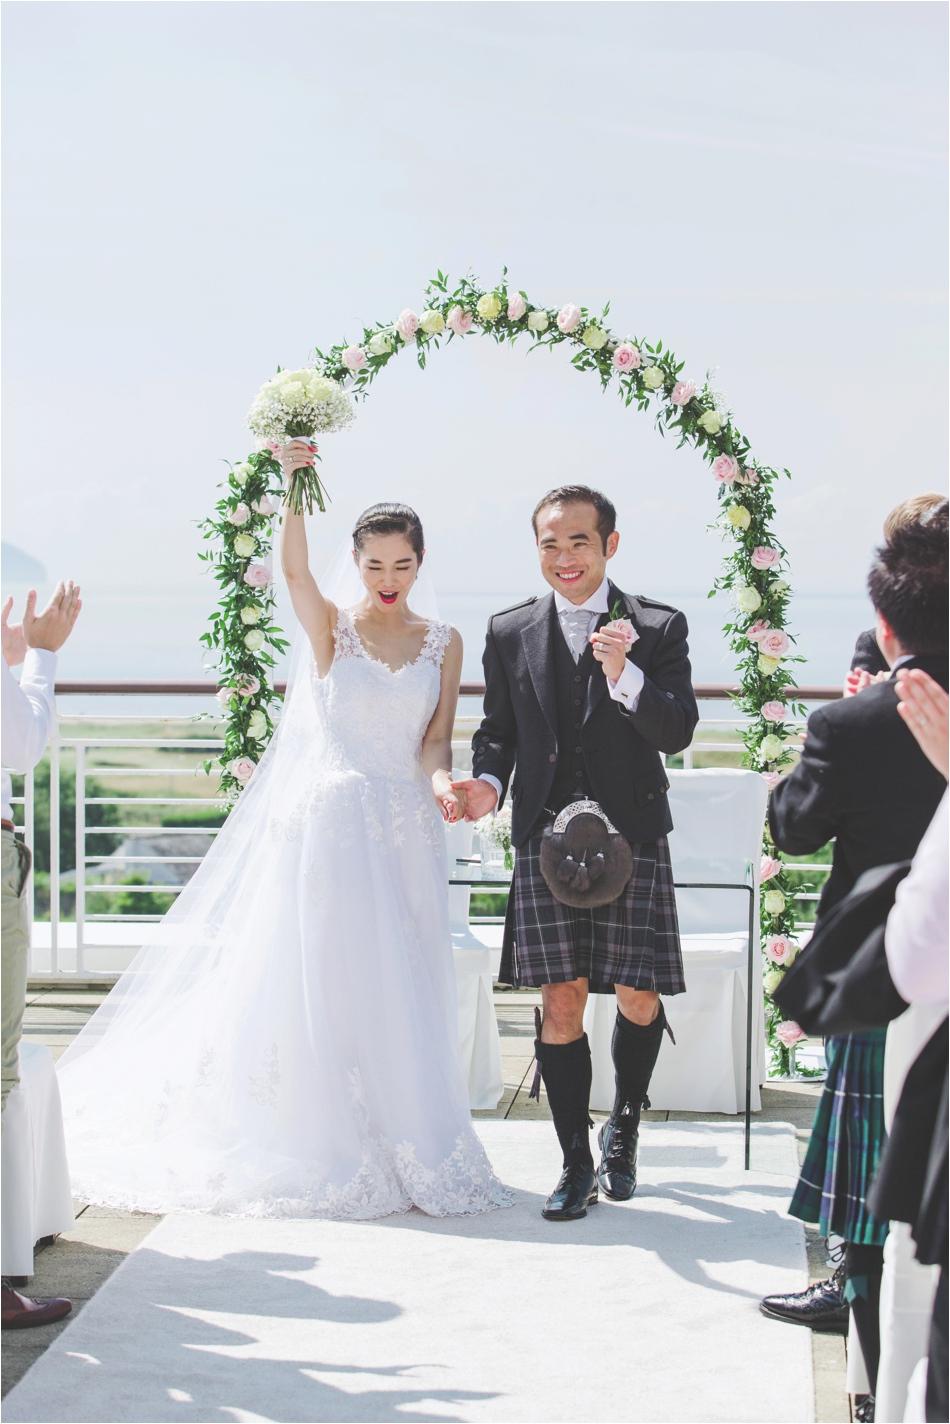 fine art wedding photographers scotland glasgow 5-5.jpg